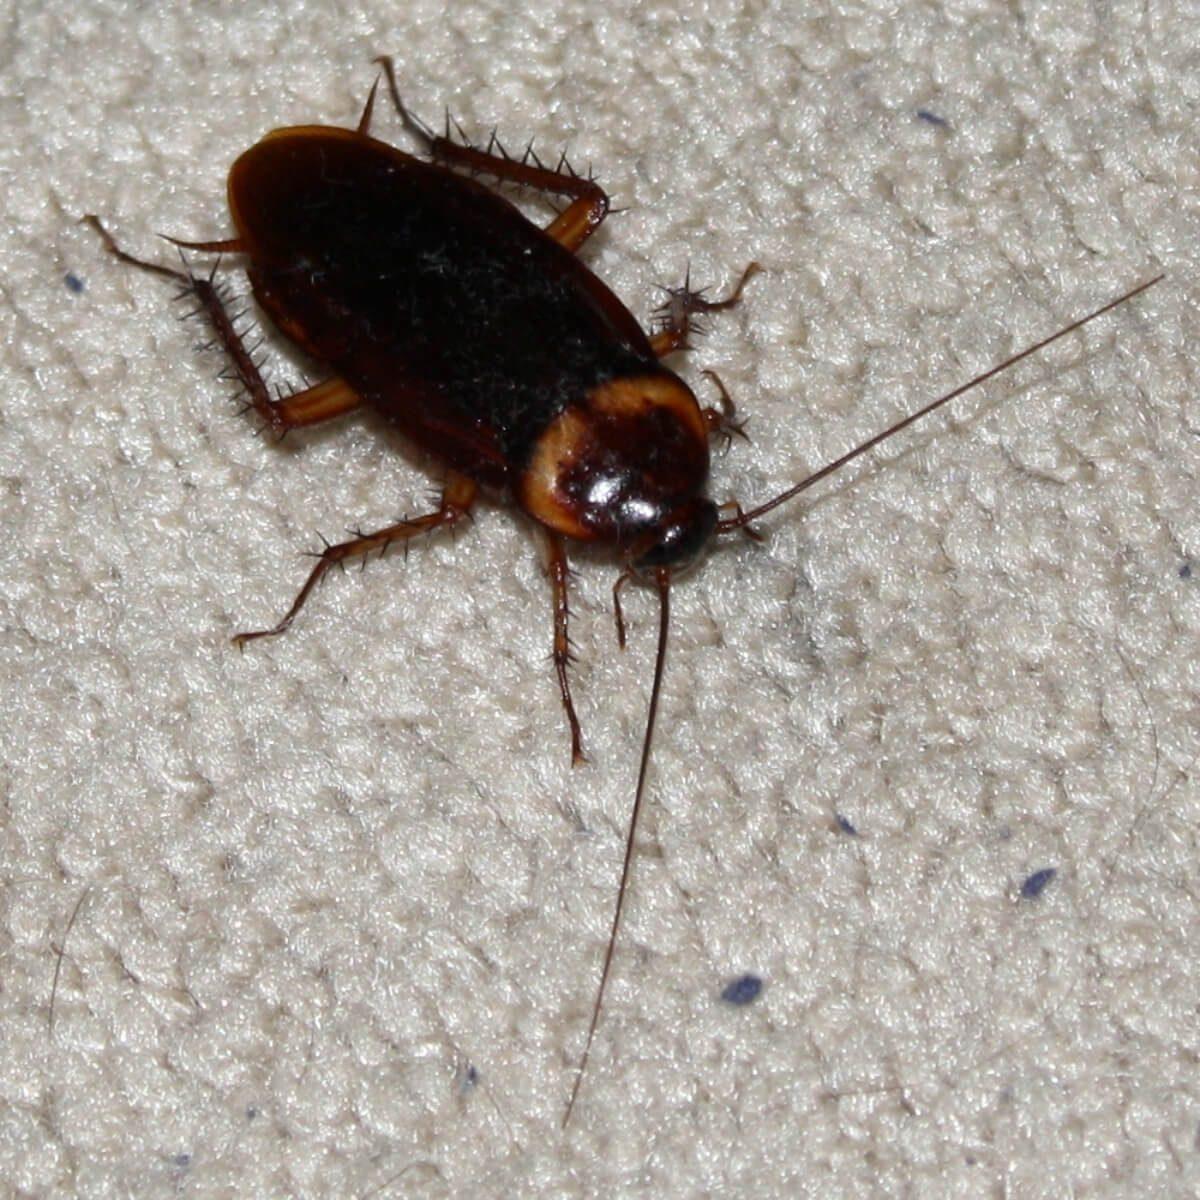 Common house cockroach